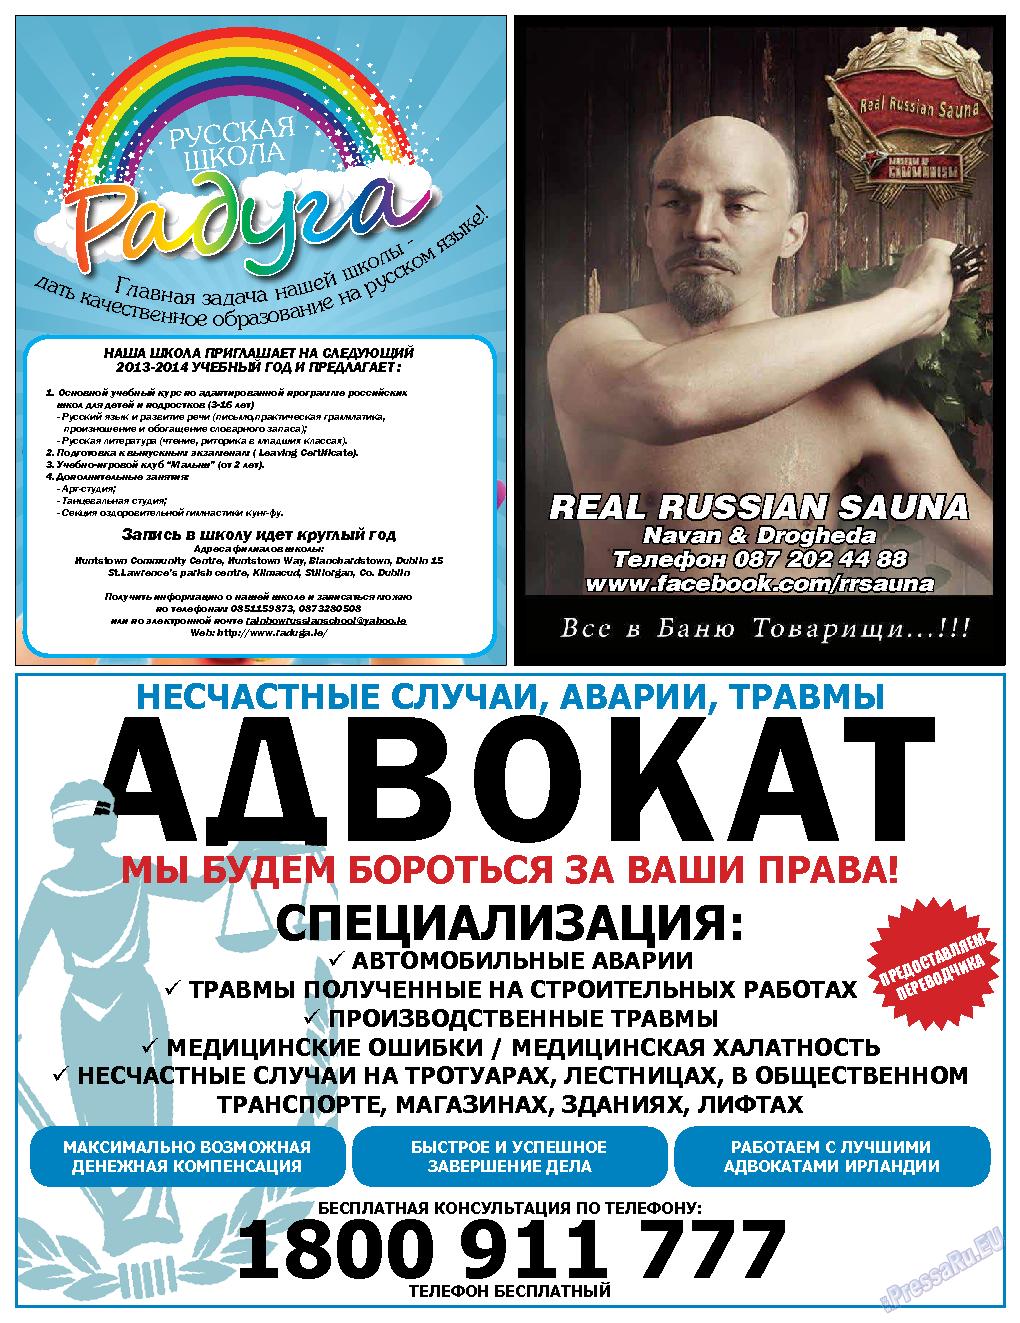 Дублин инфоцентр (газета). 2013 год, номер 30, стр. 16